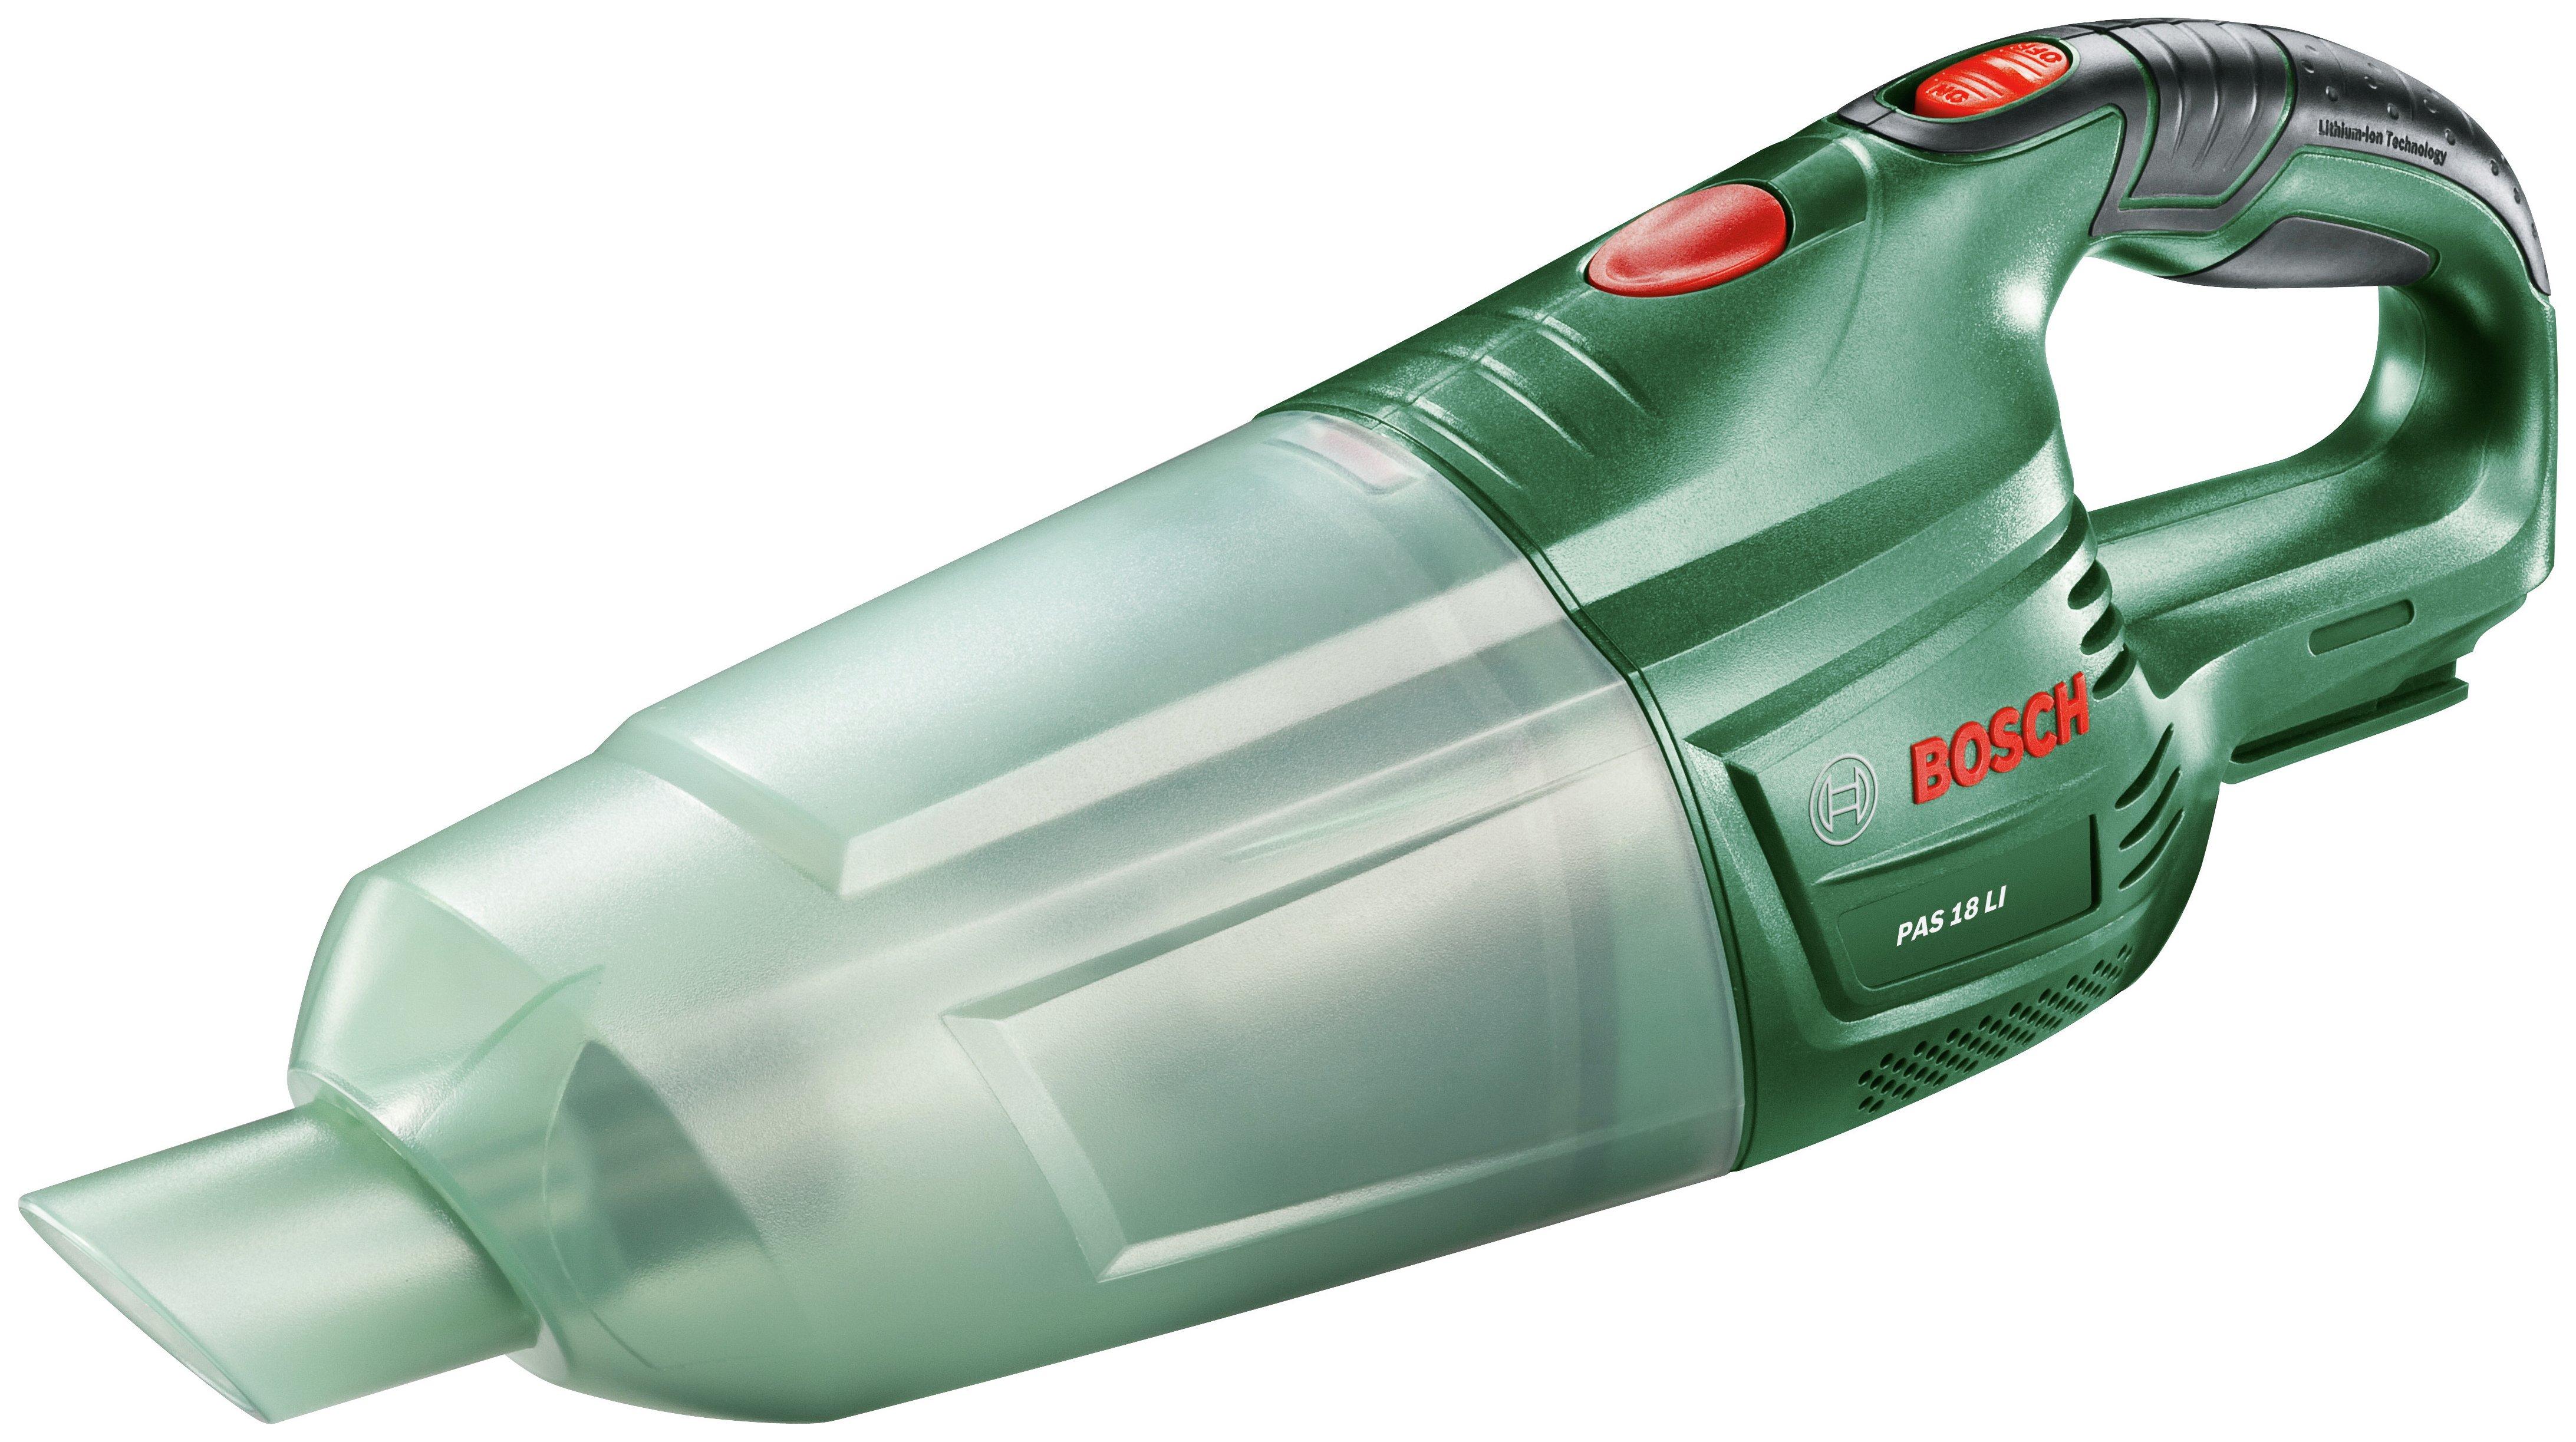 Bosch Bare Pas 18 Li Handheld Vacuum Cleaner - No Battery